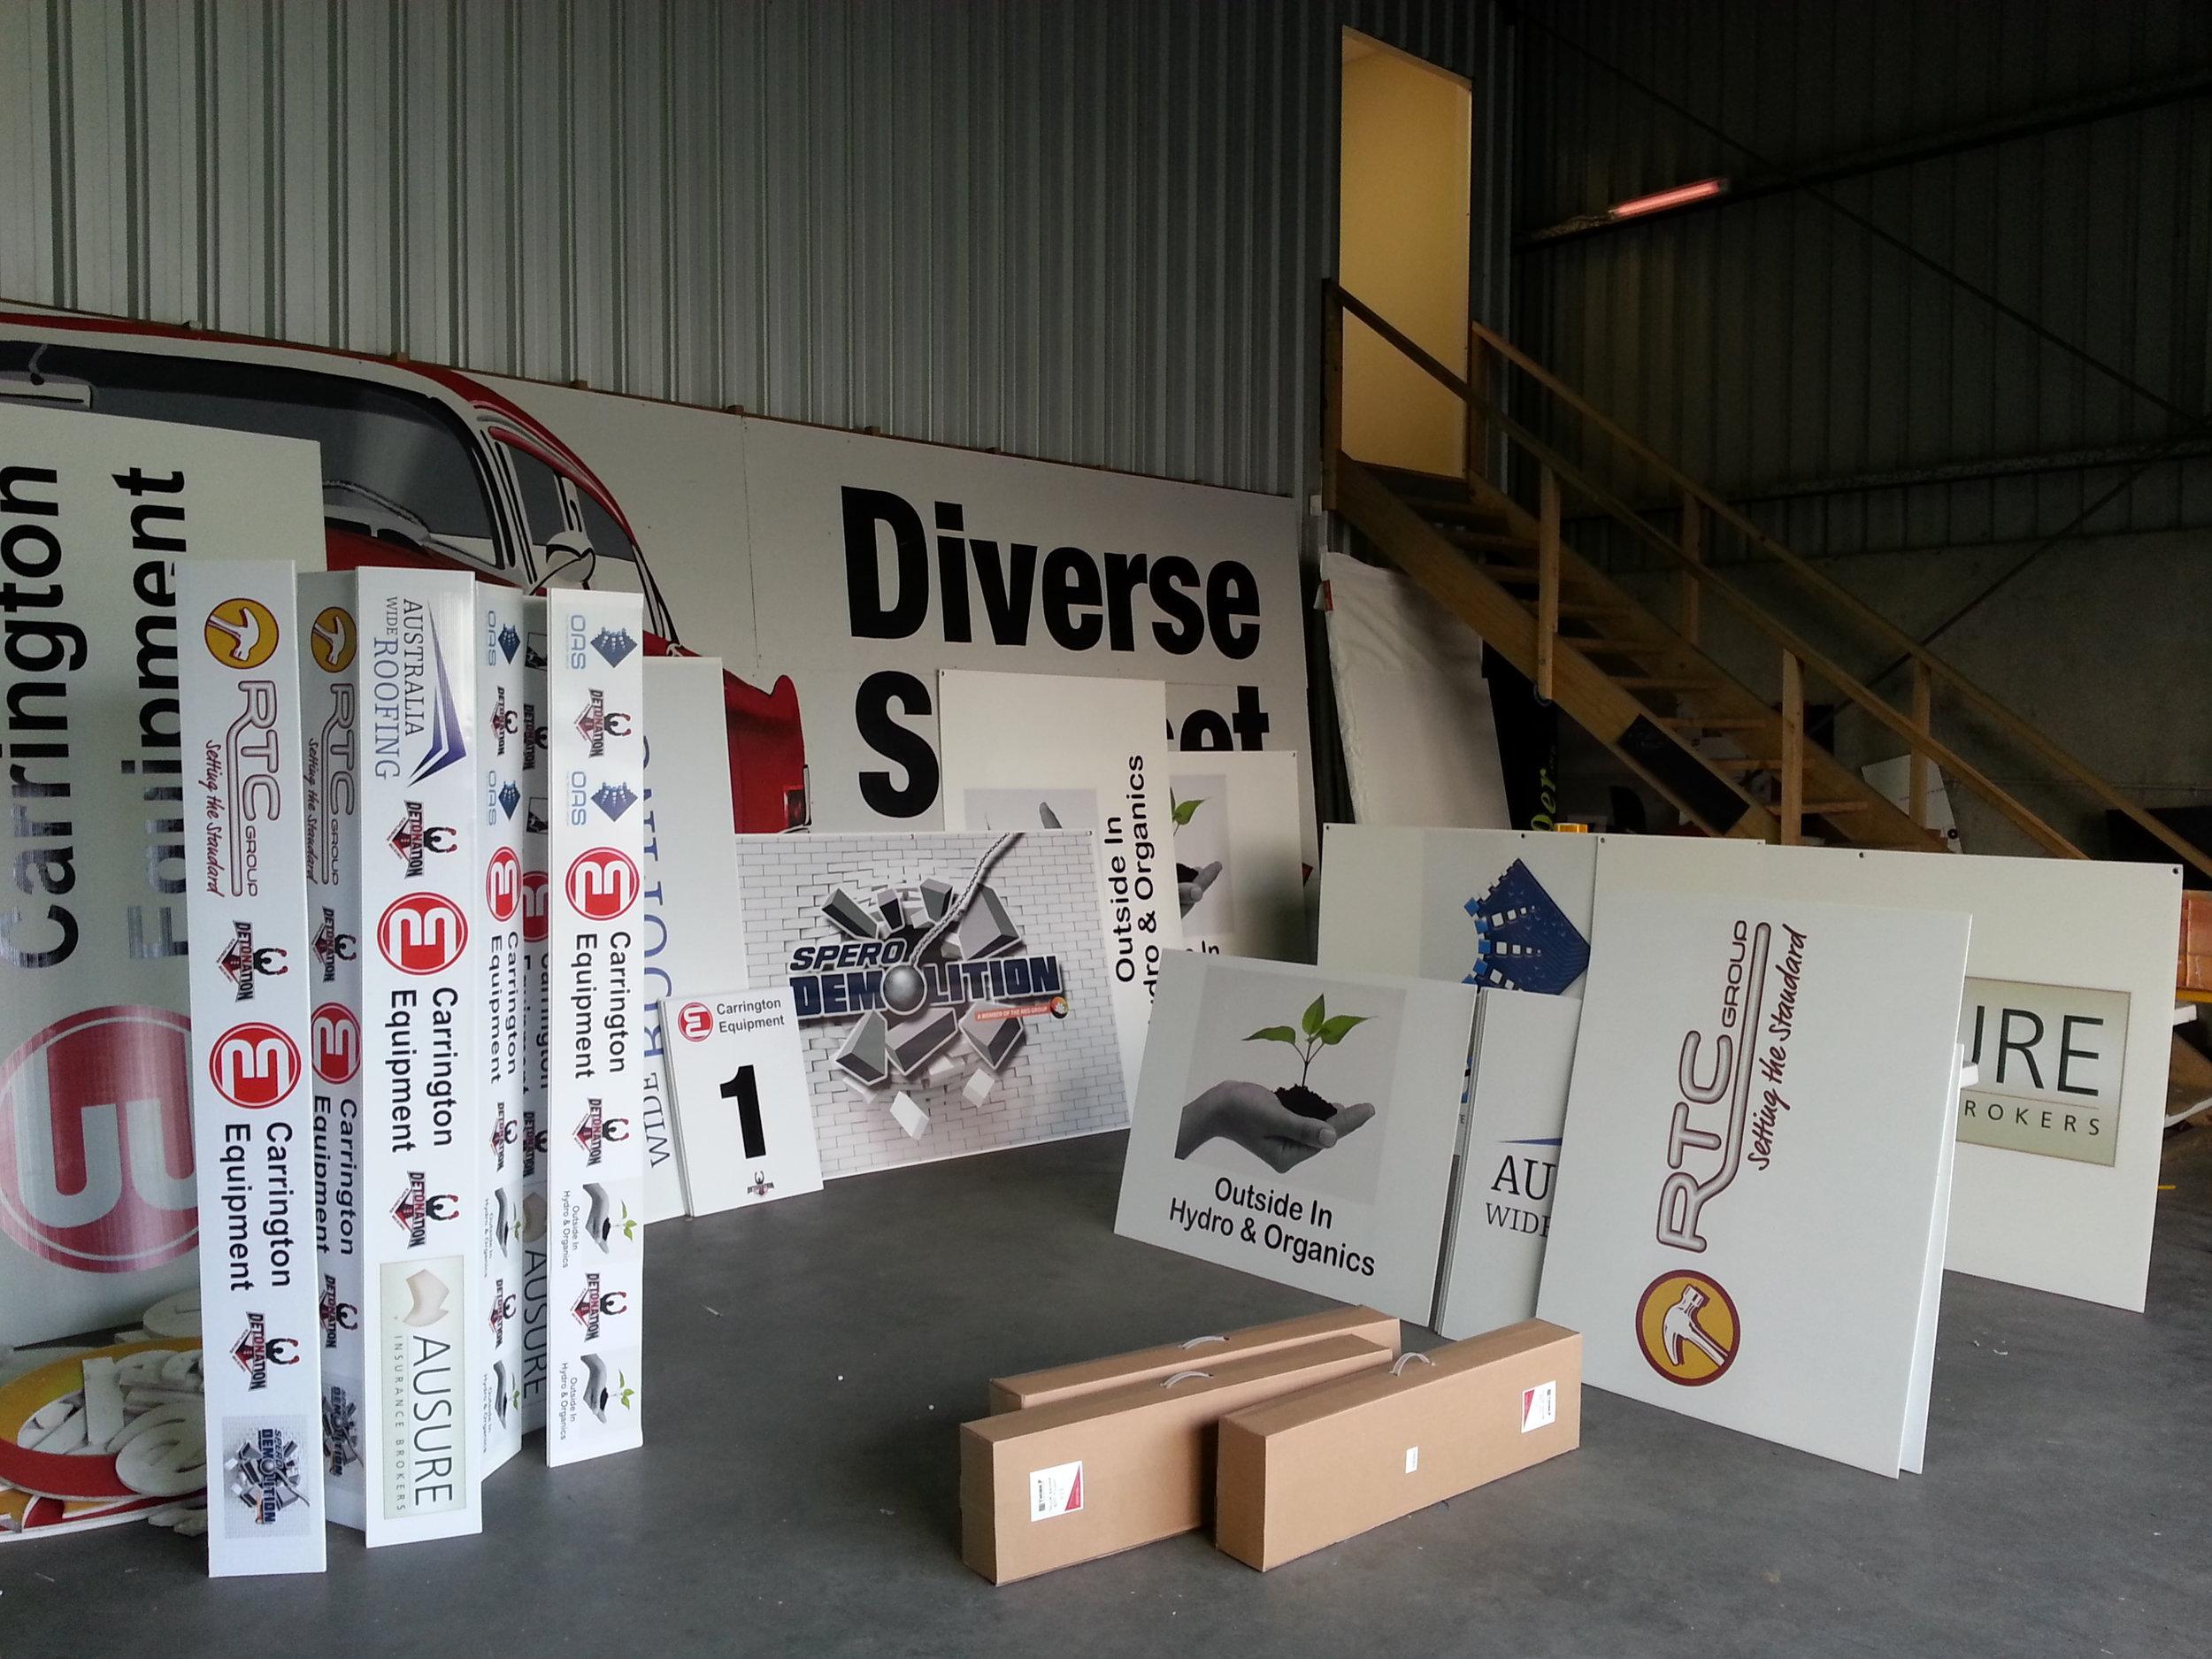 detonation boxing promotional signs.jpg